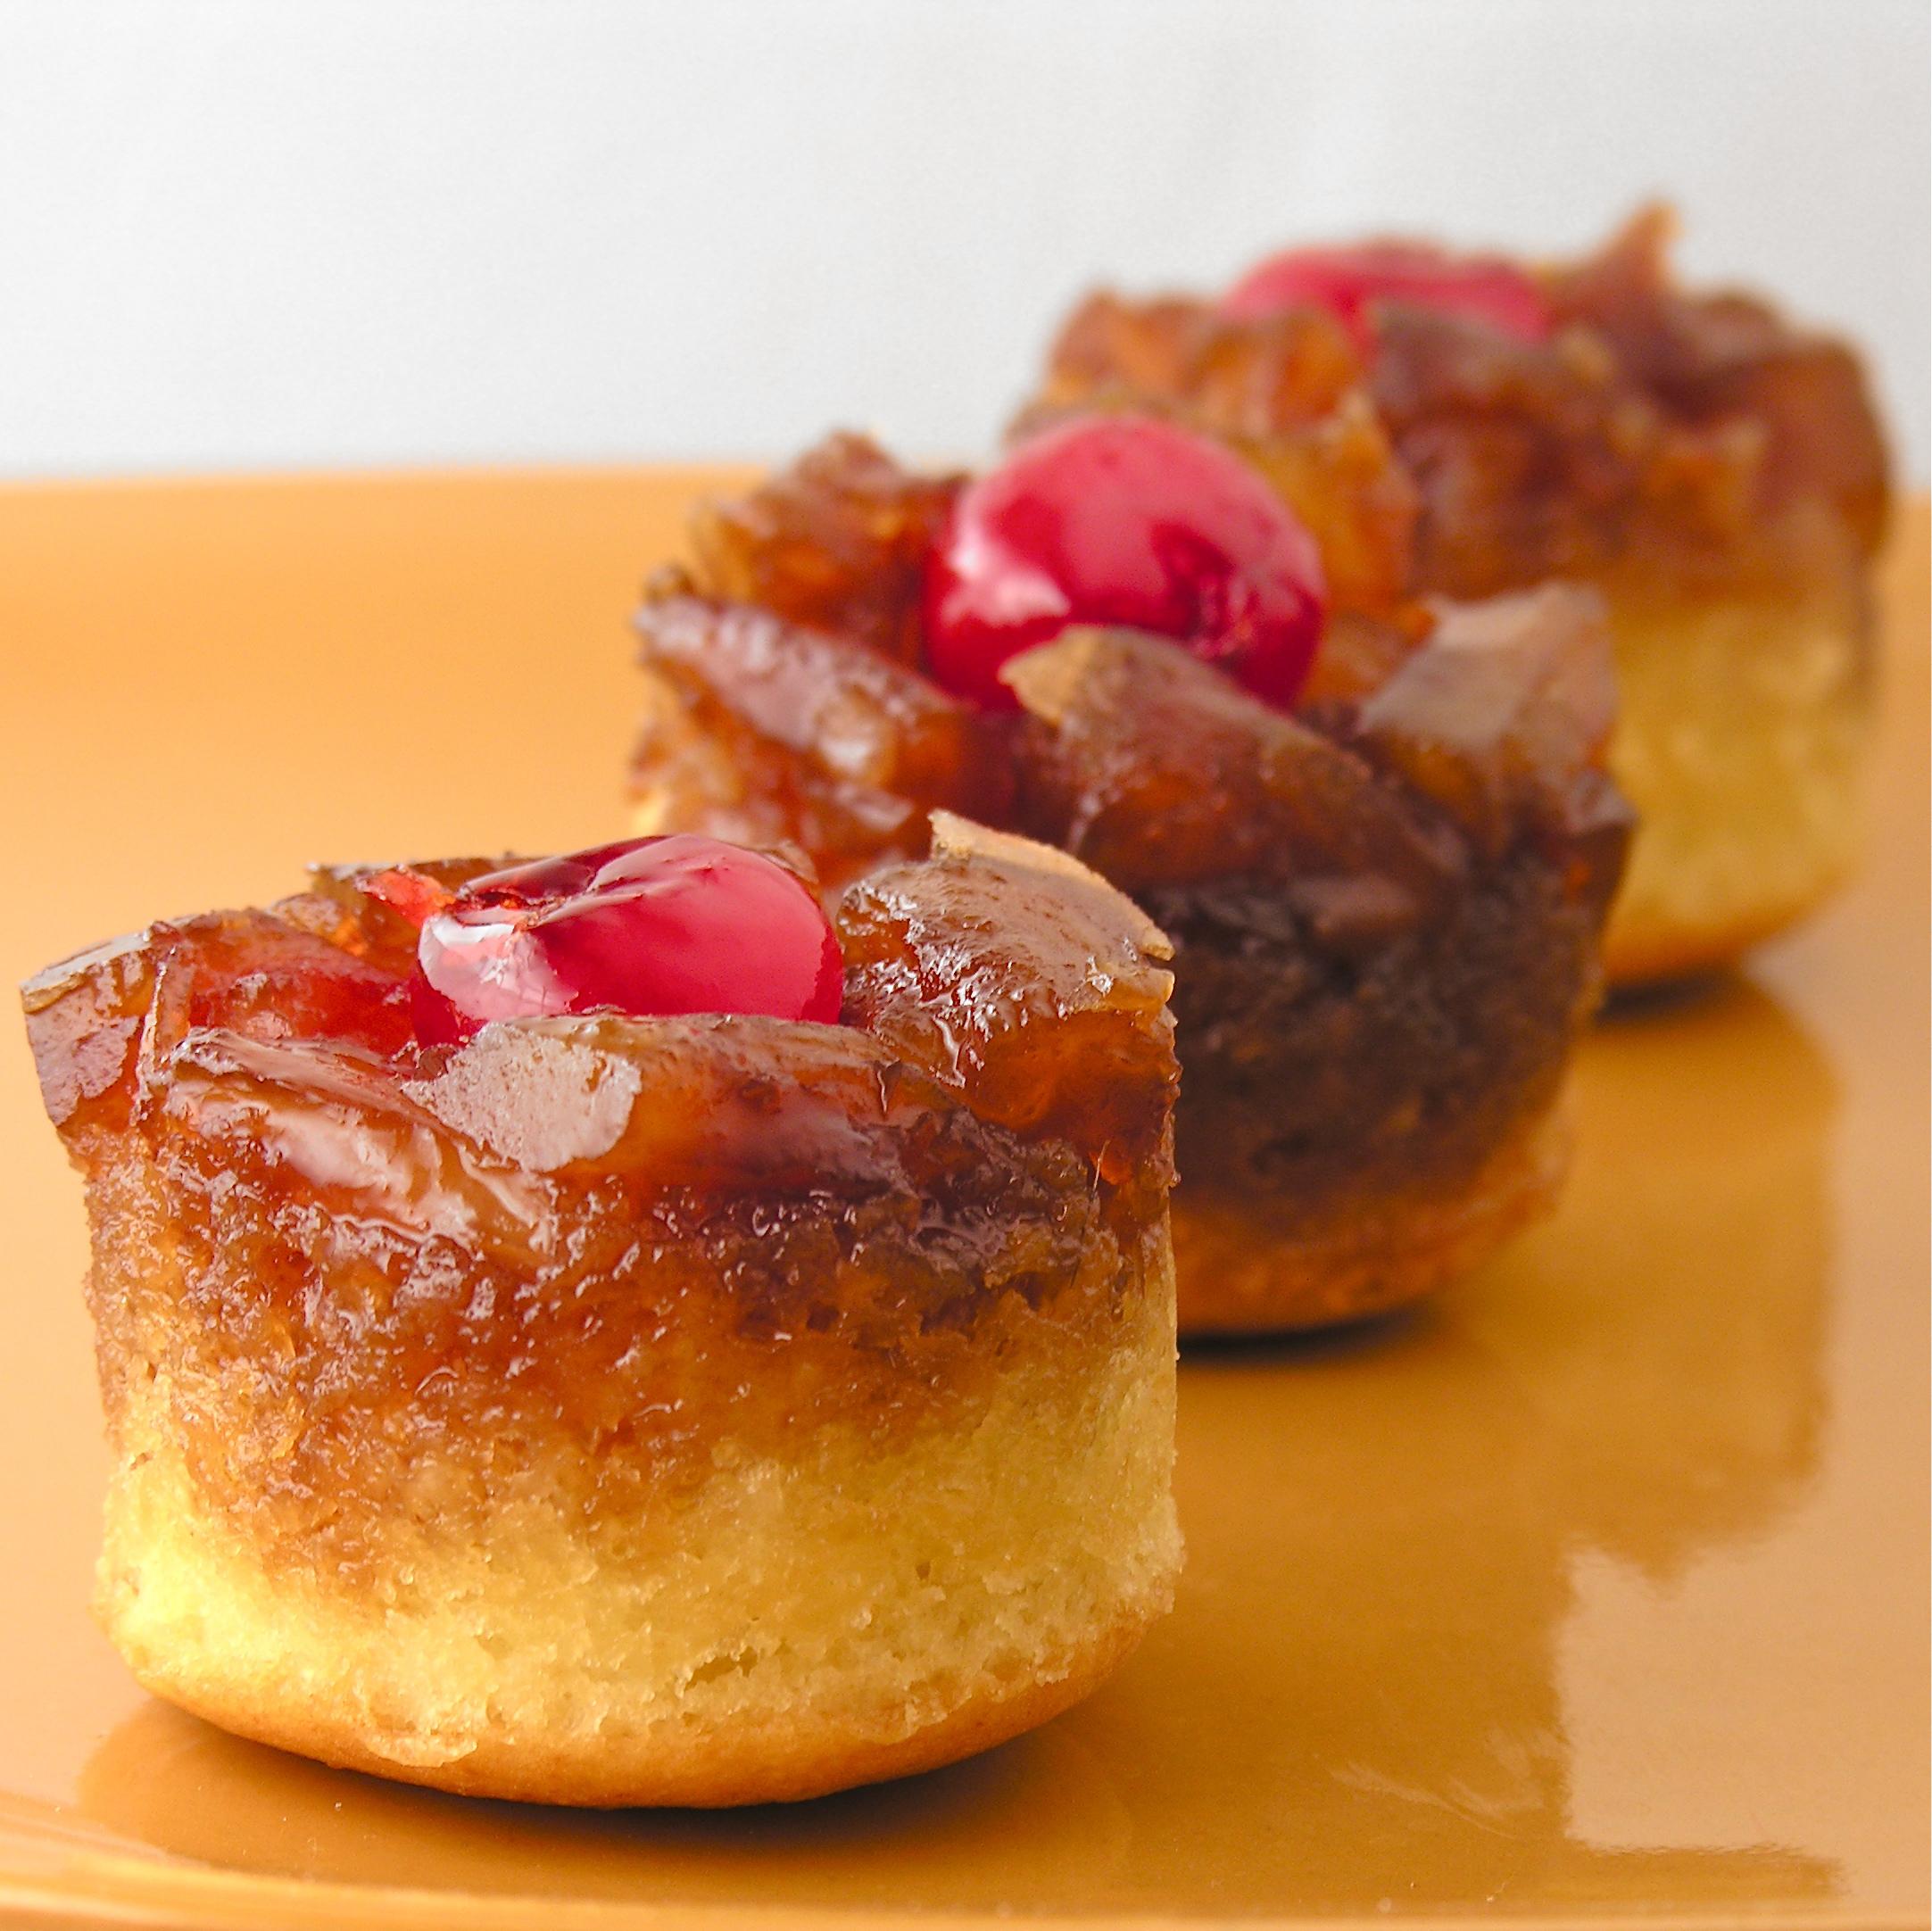 Mini Pineapple Upside Down Cakes | eASYbAKED